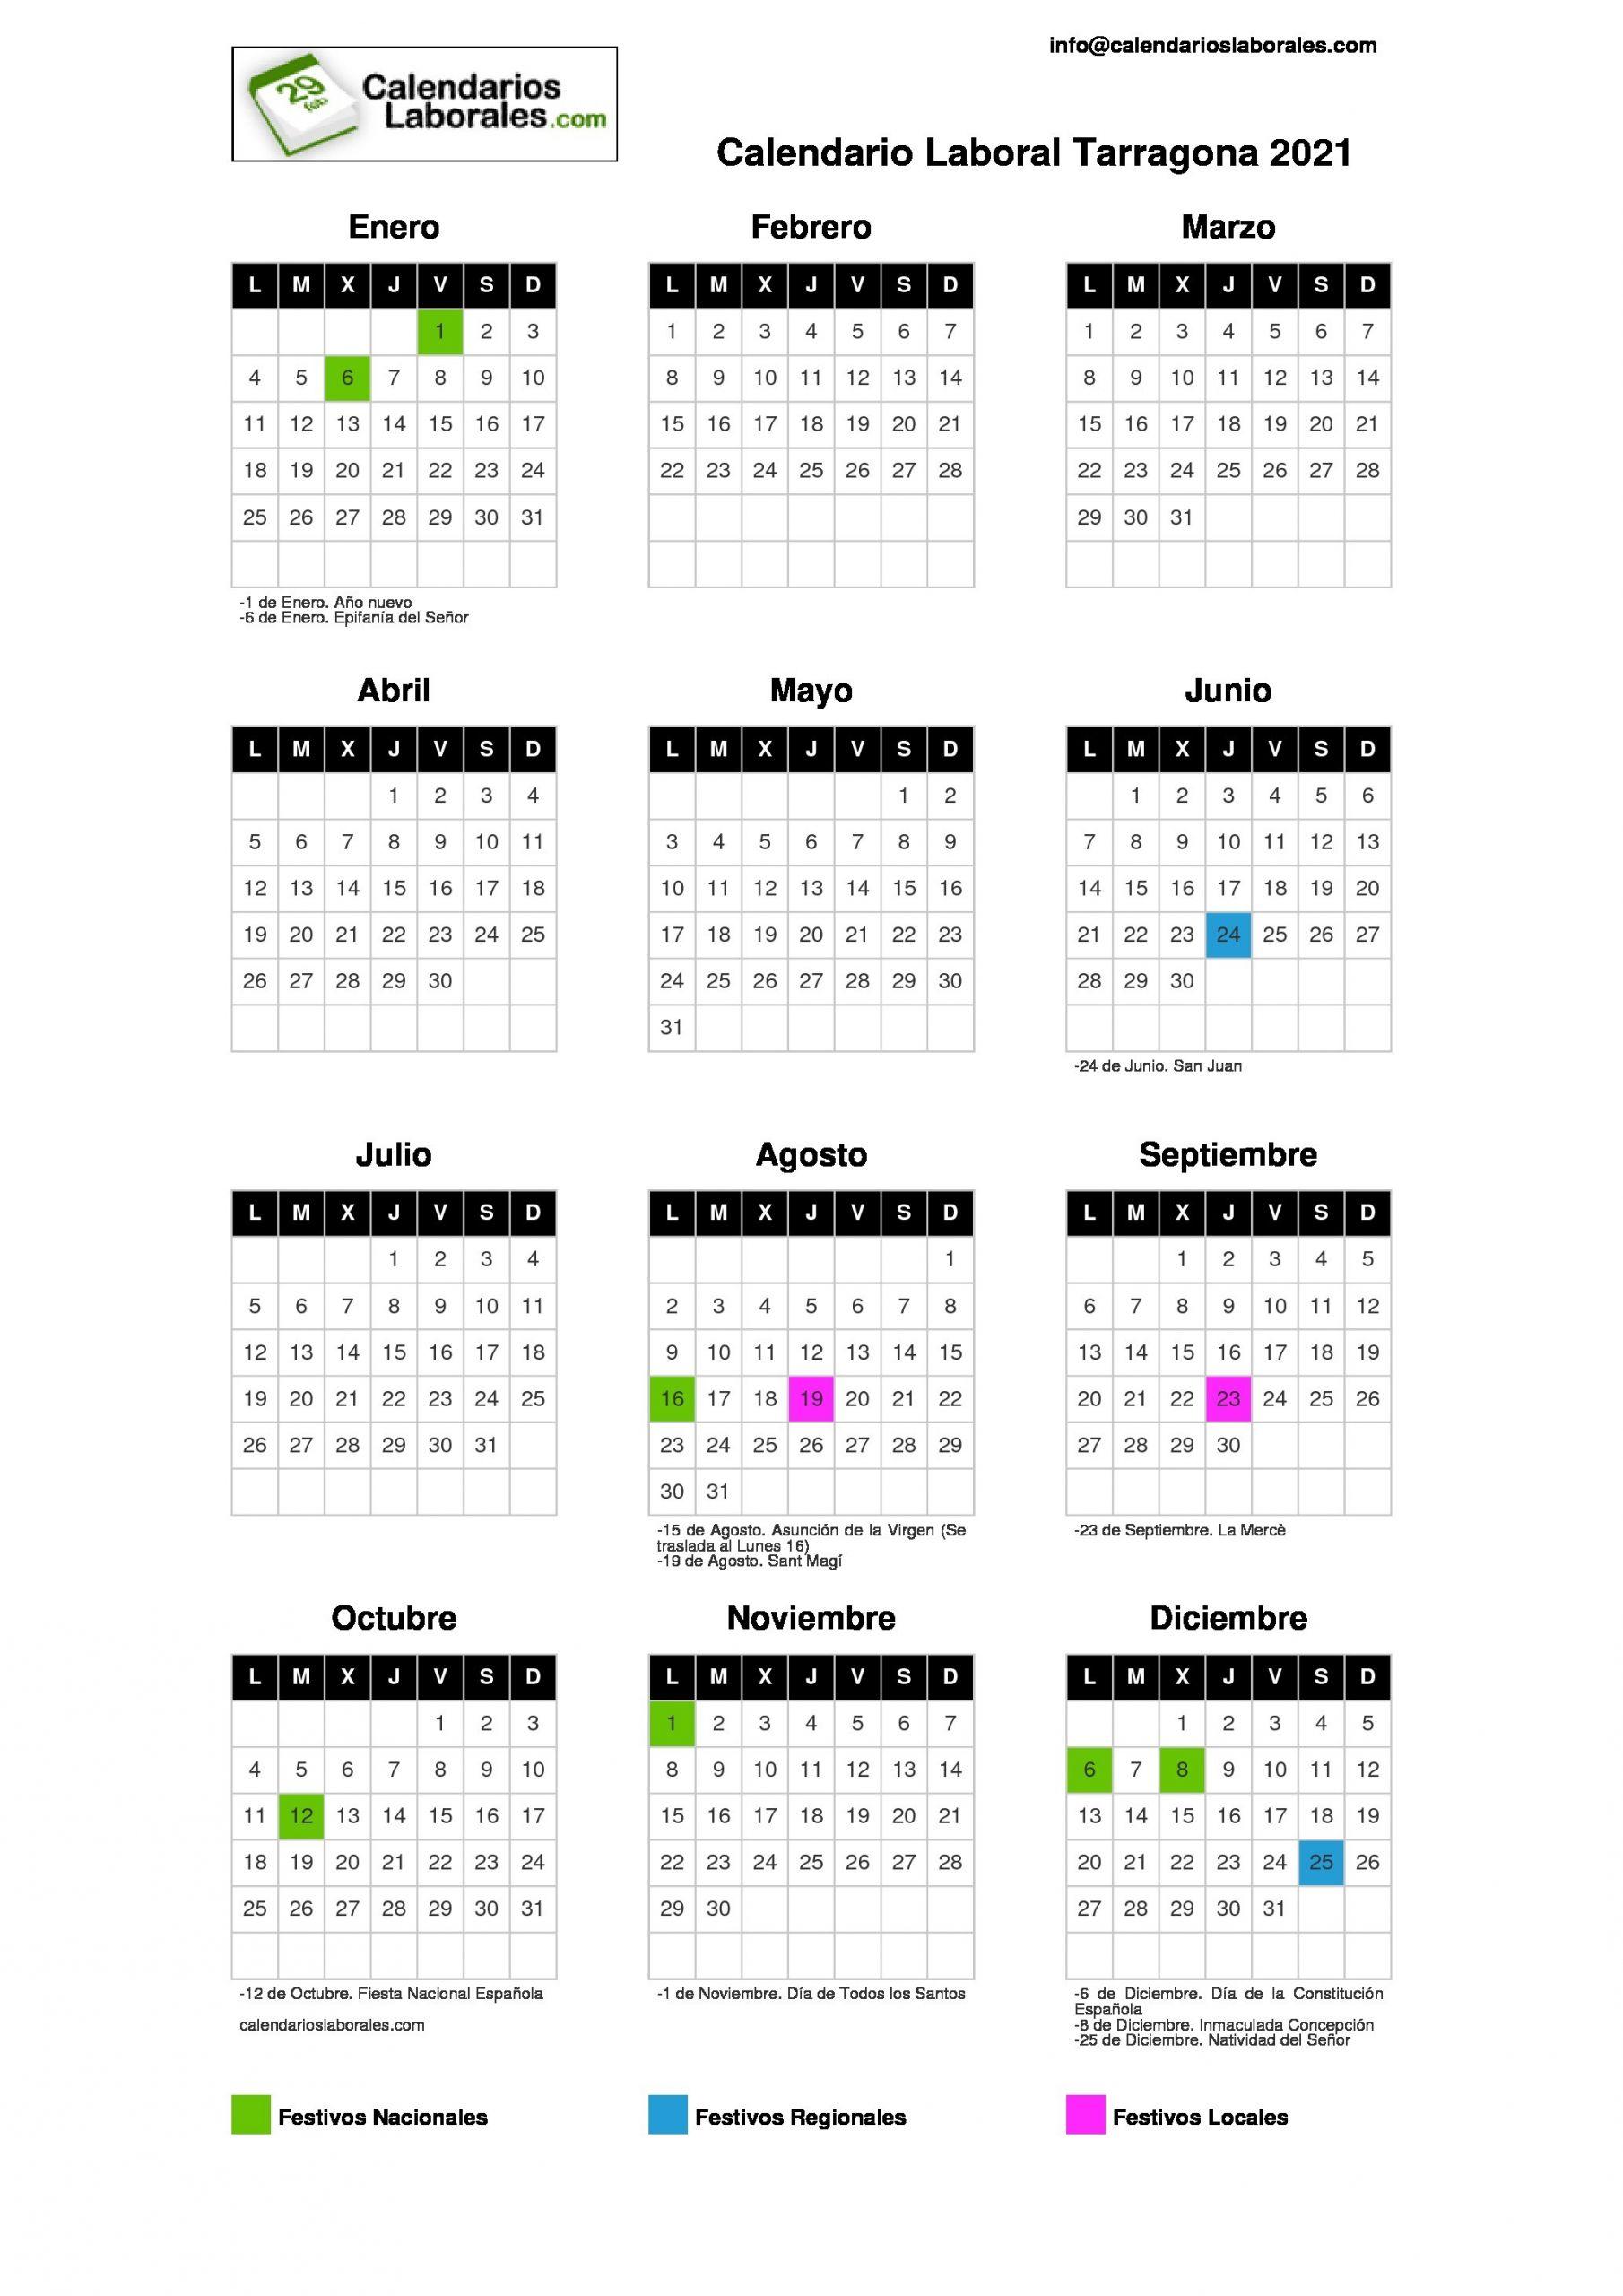 calendario laboral tarragona 2021